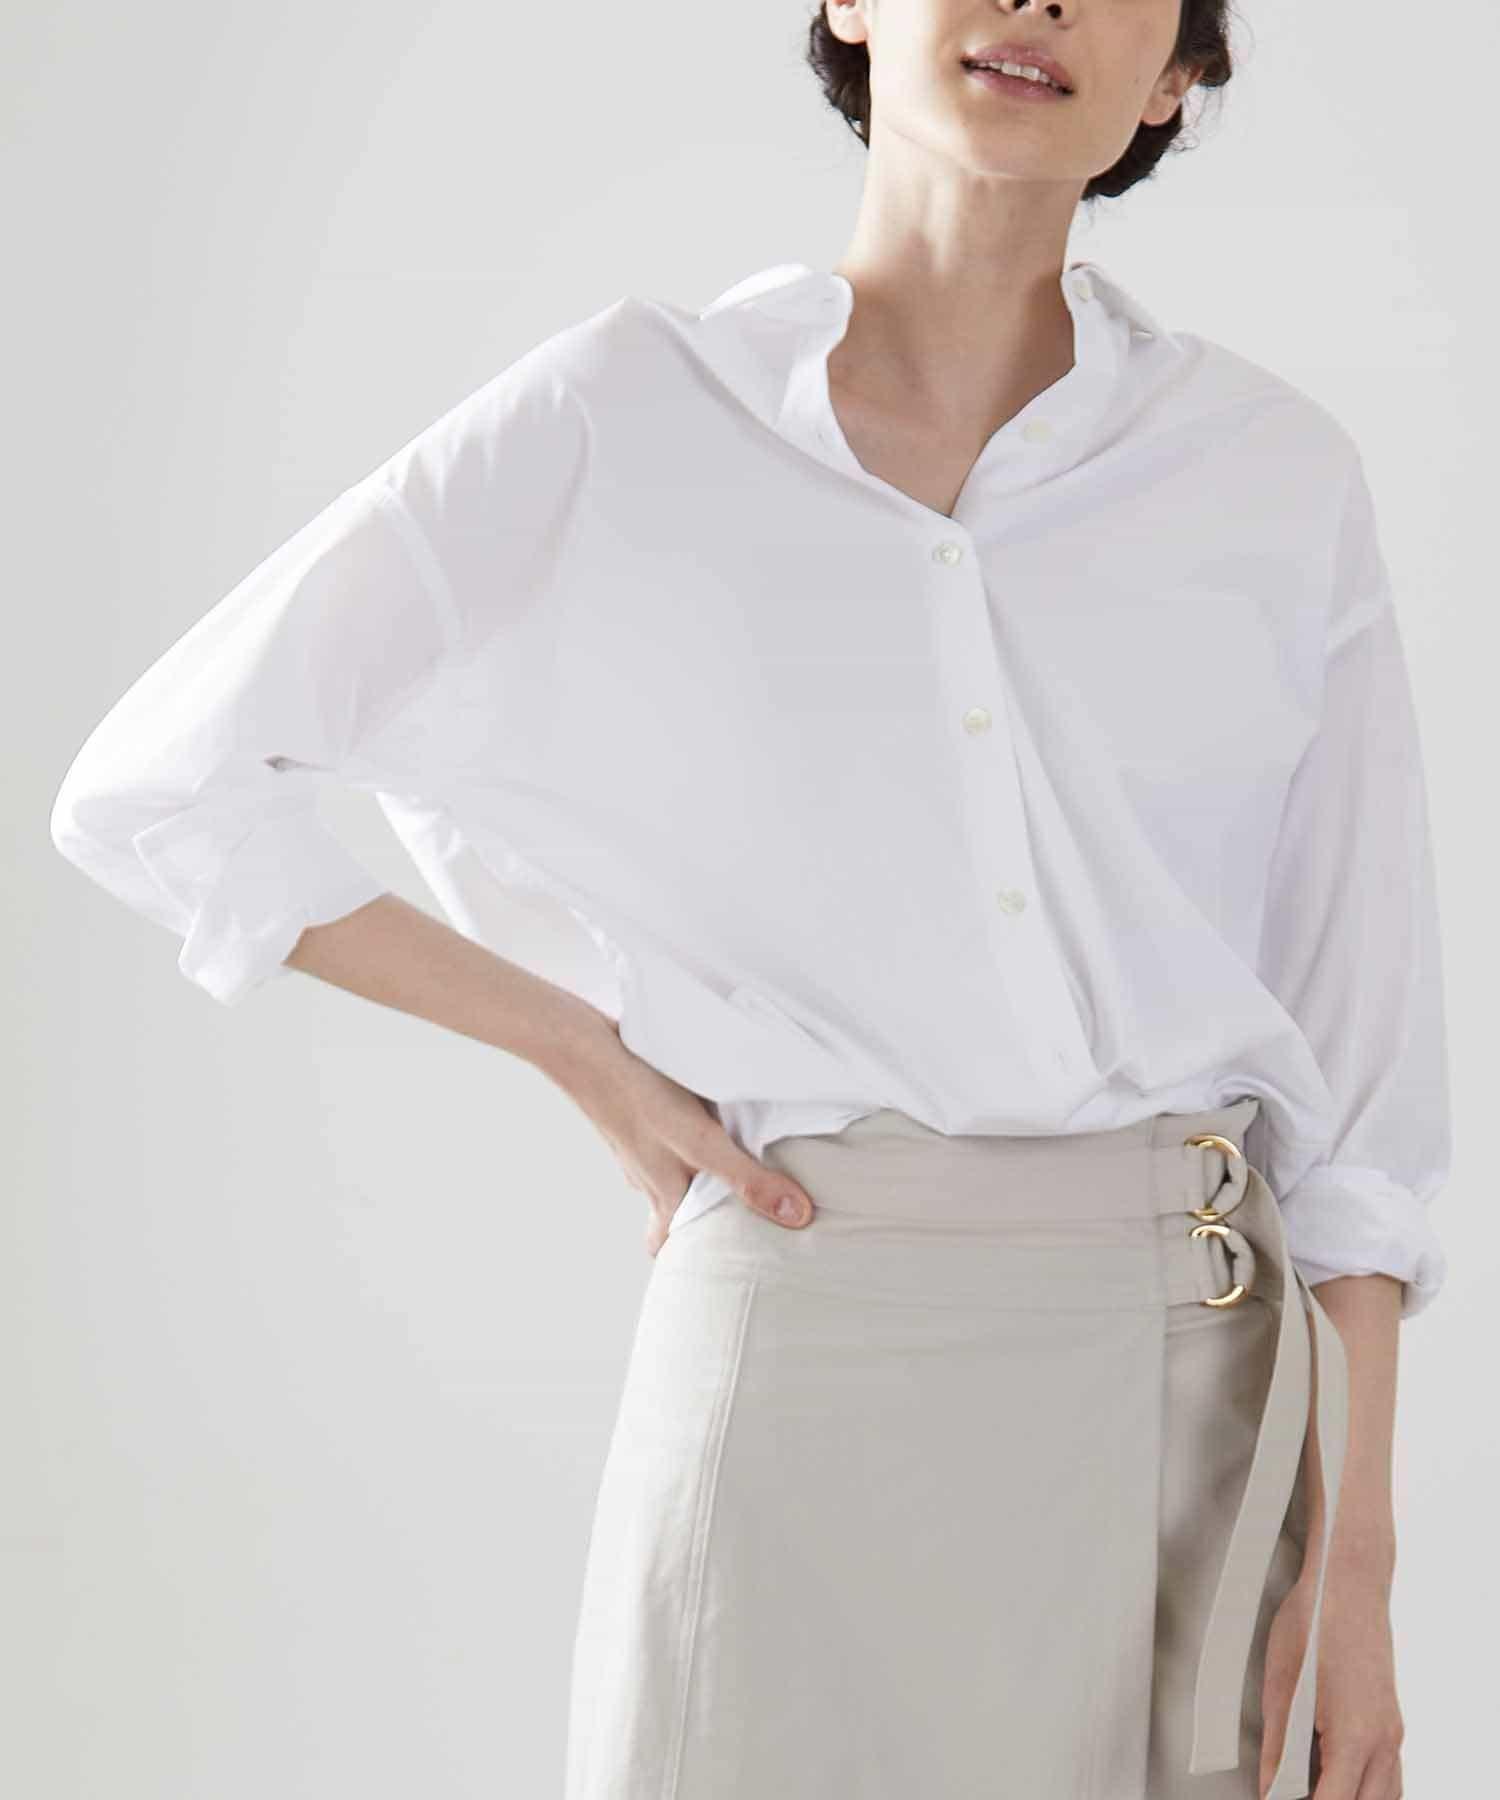 OUVRAGE CLASSE(ウヴラージュクラス) レディース クレンゼオーバーサイズシャツ ホワイト